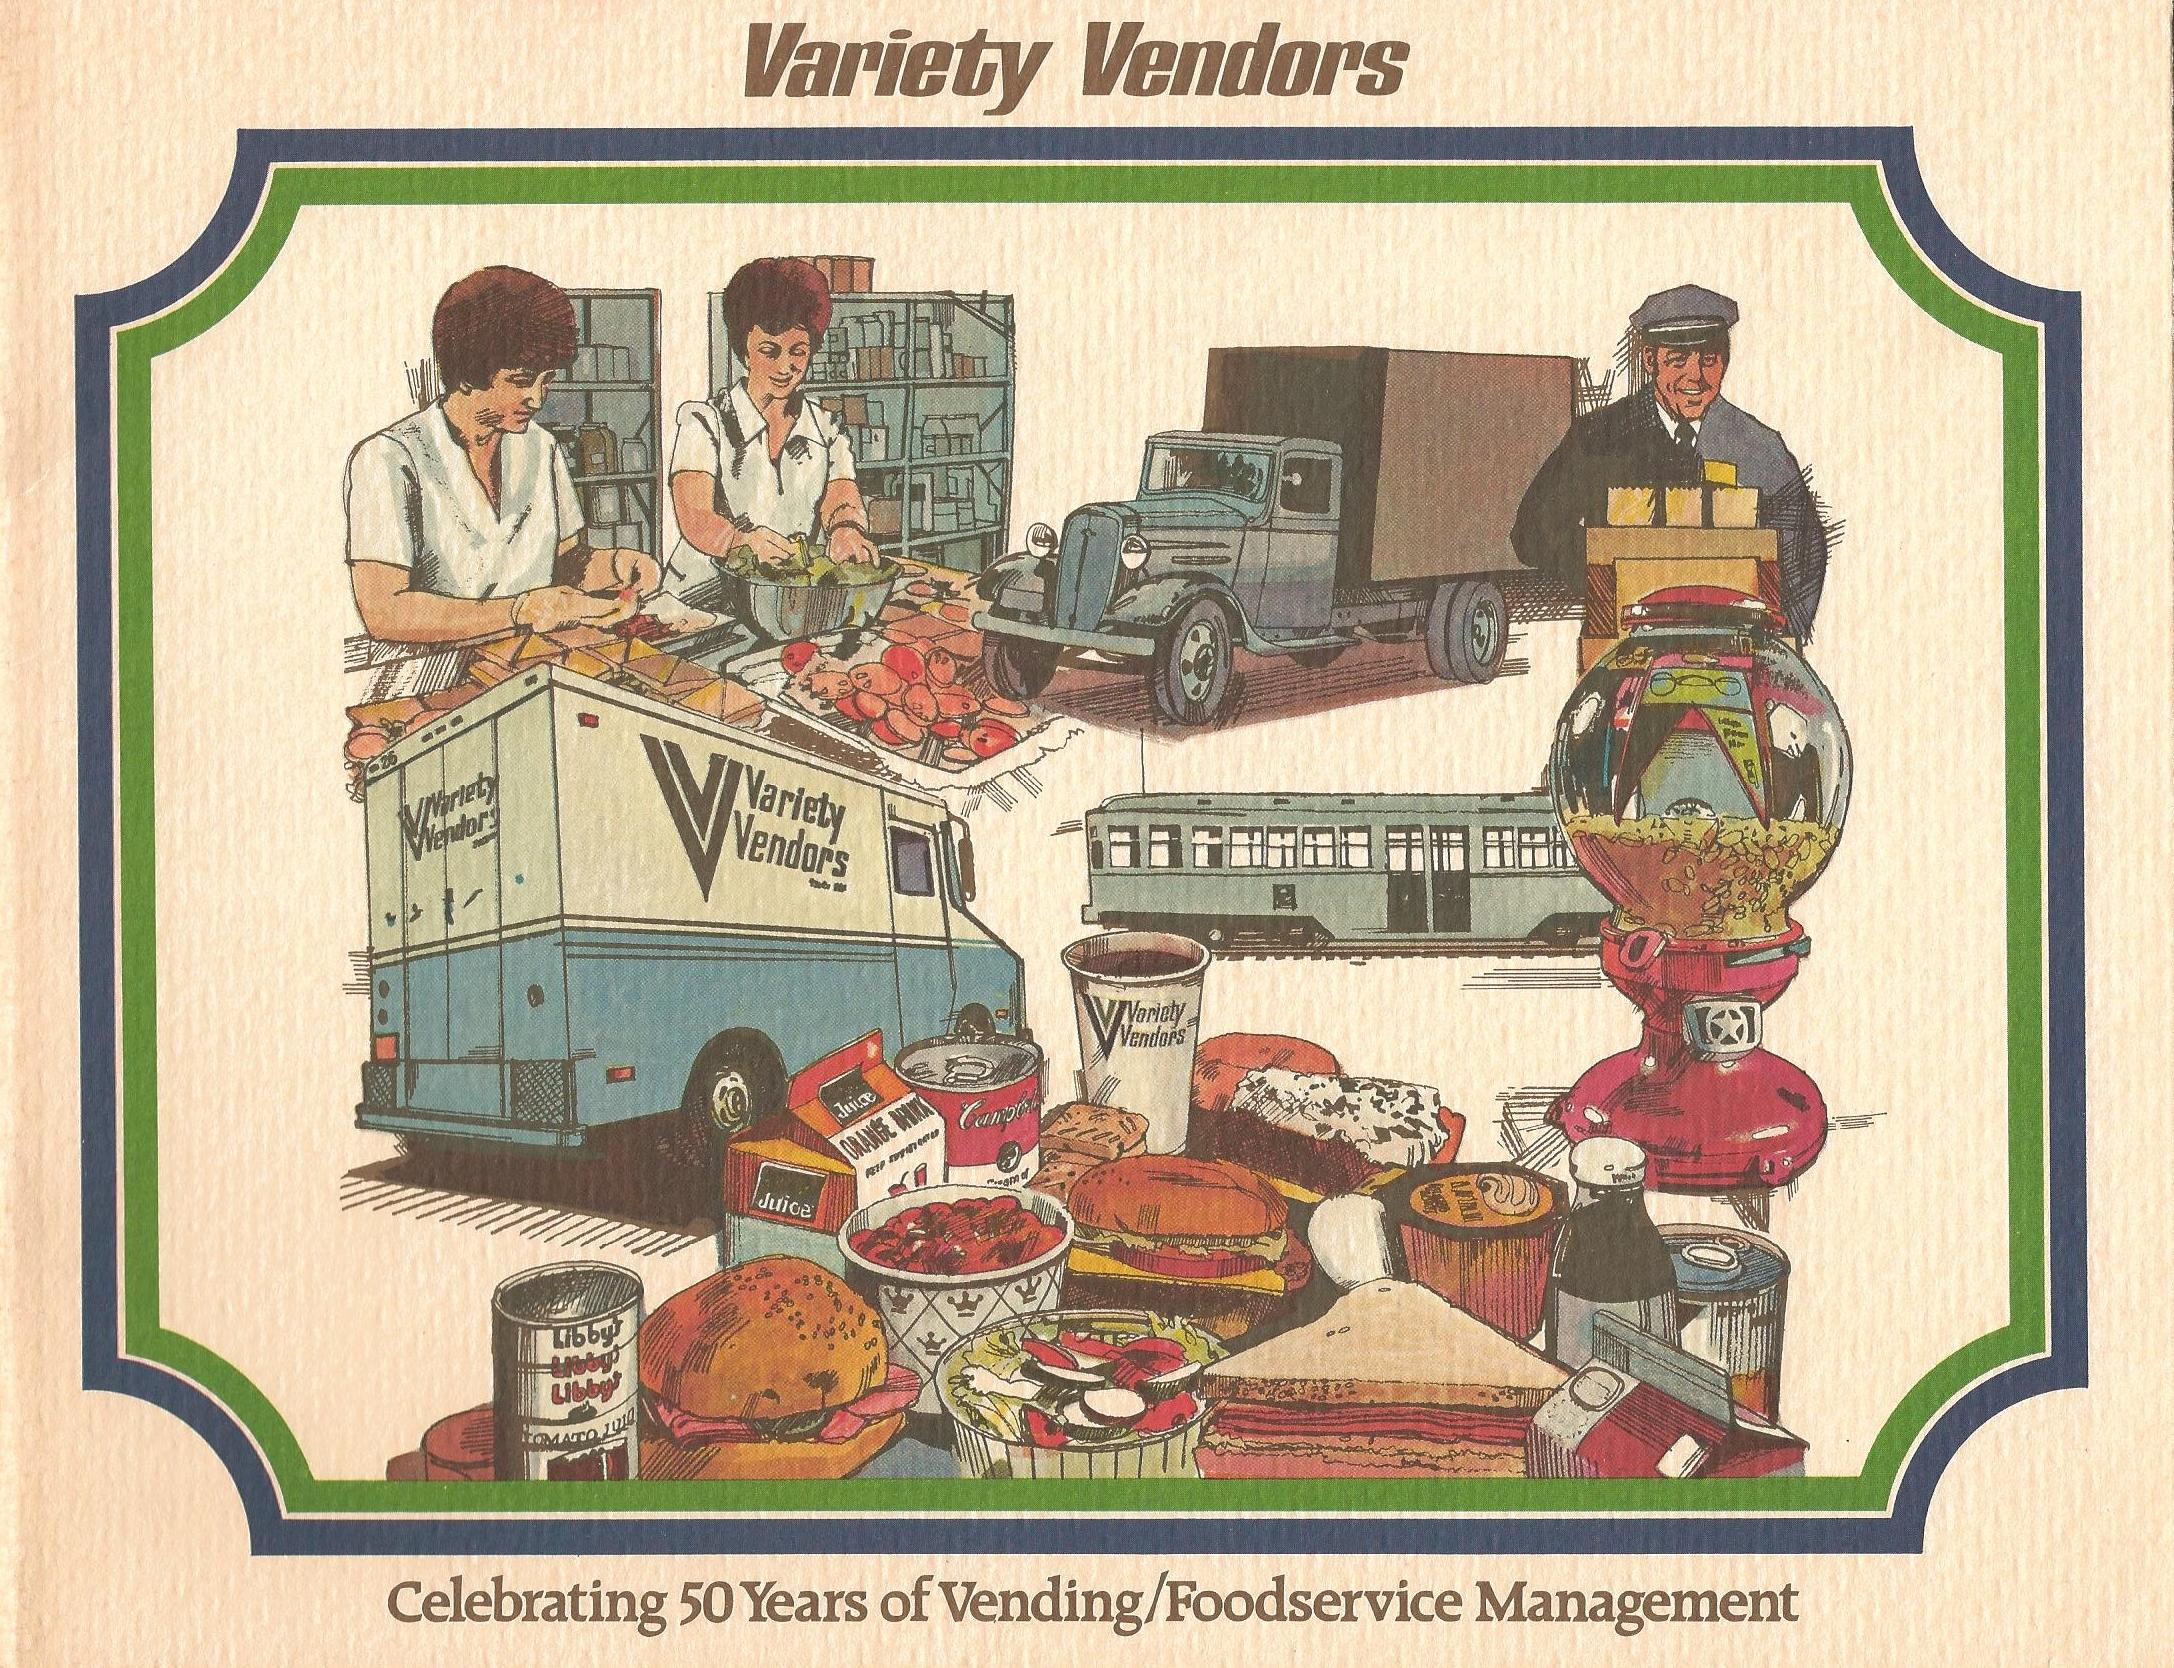 Variety Vendors